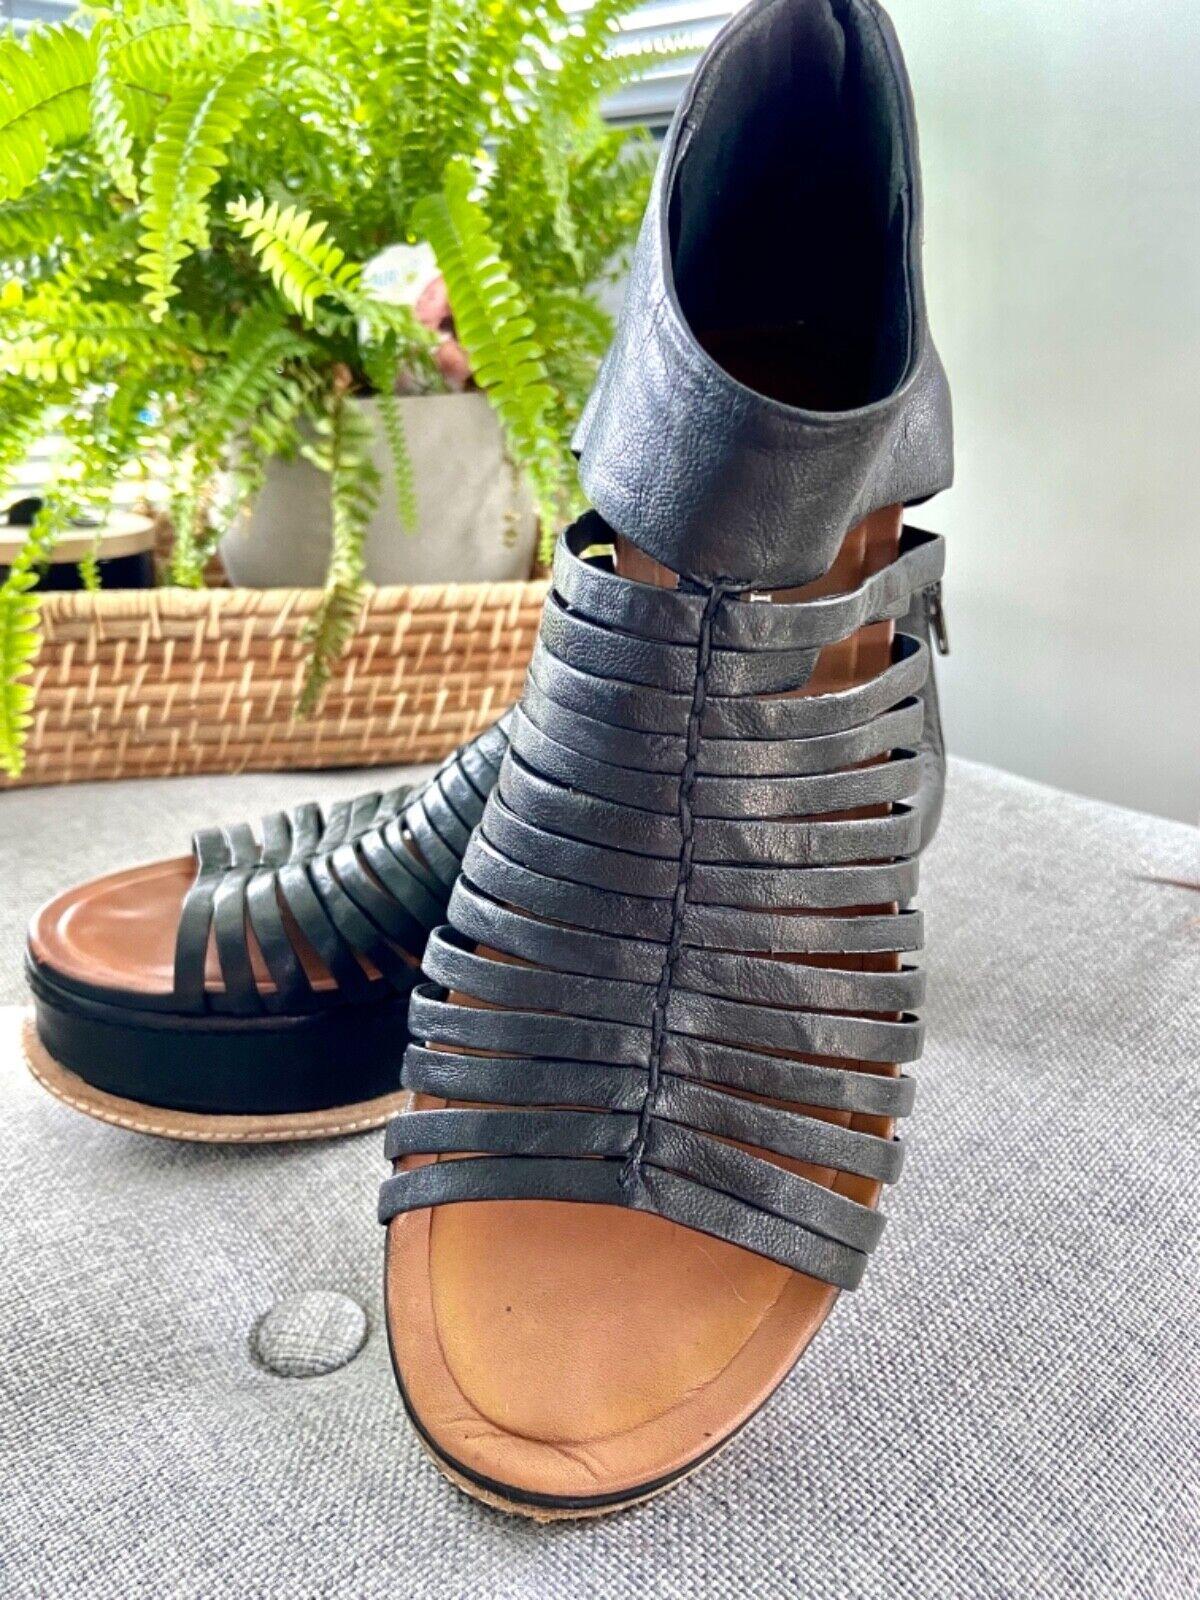 Roberto Durville women's Black leather platform peep toe comfortable shoe with